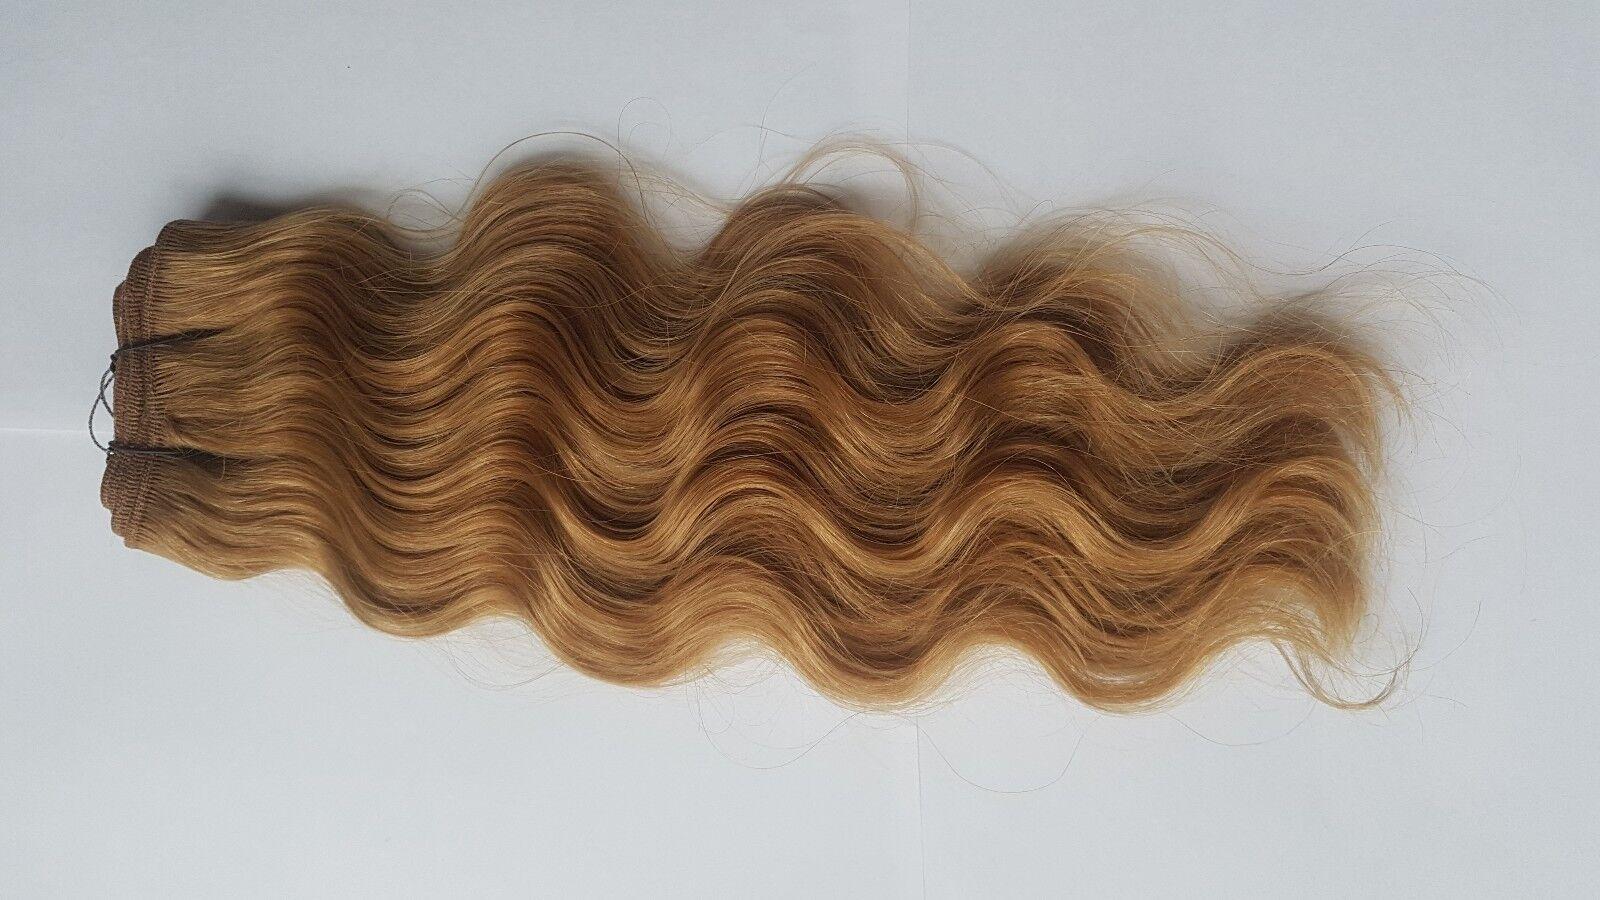 I capelli umani radicazione Reborn bambini Toddlers Loose Curl 100g bionda non Mohair